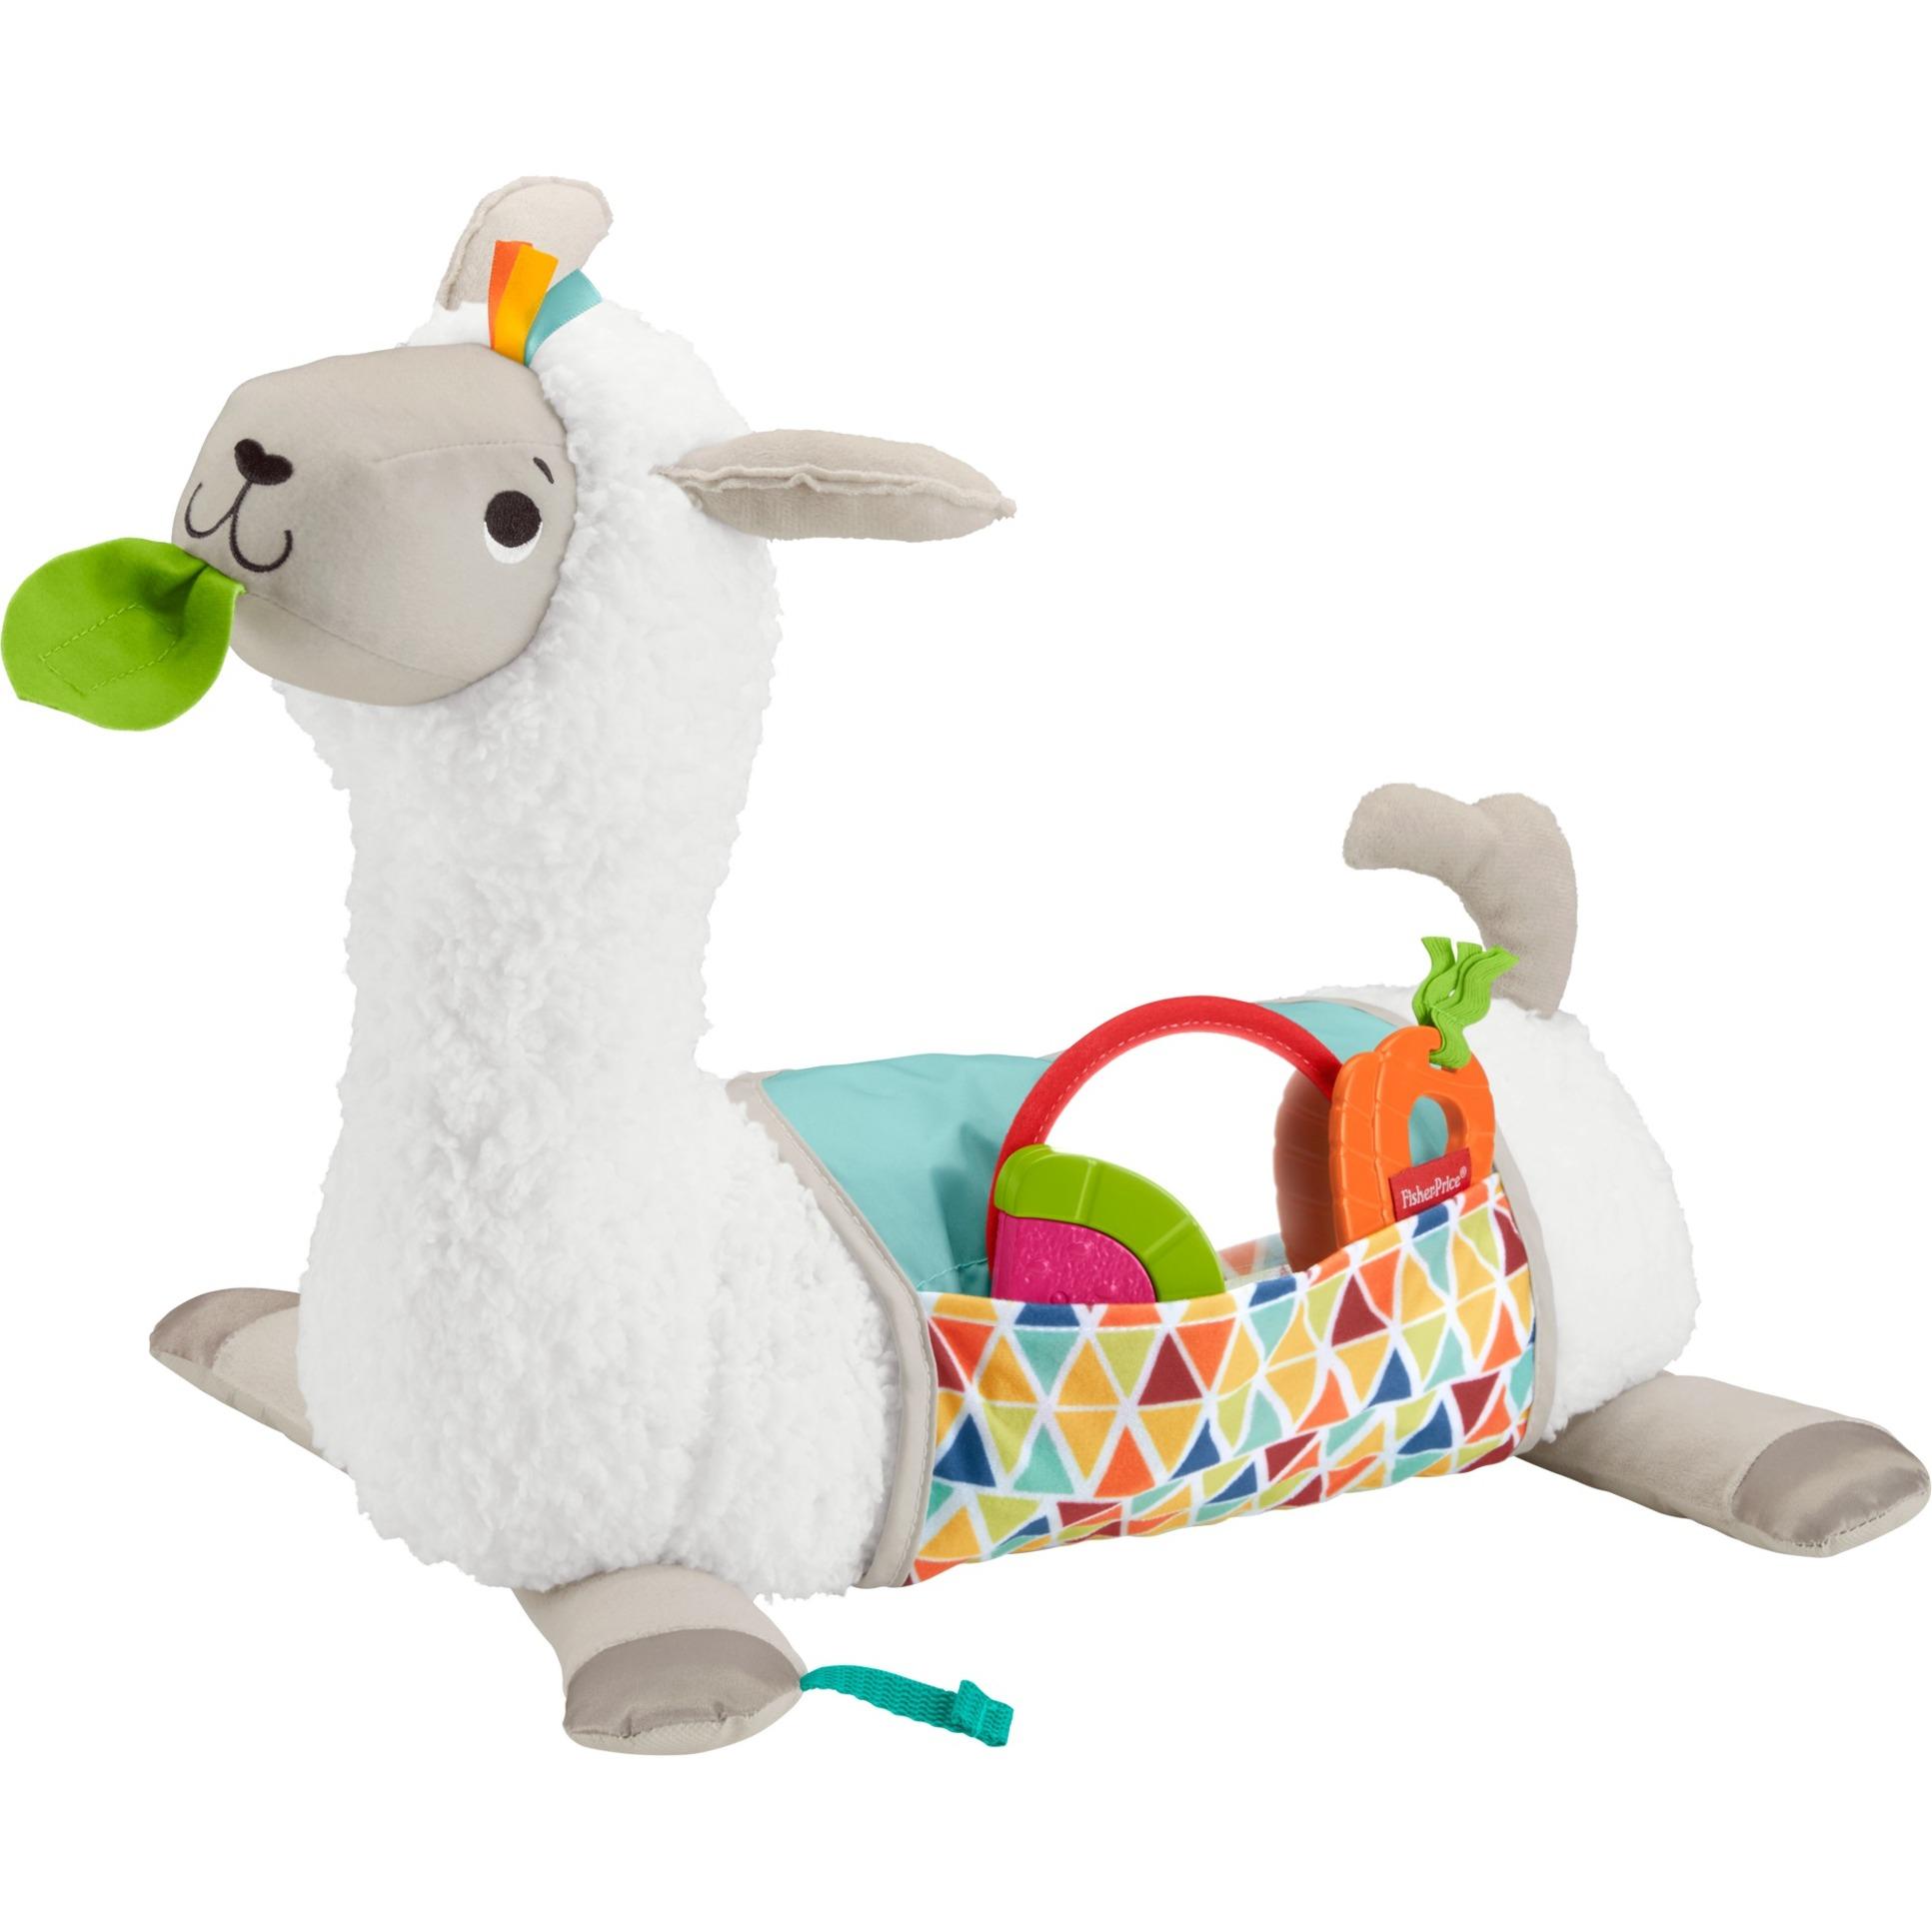 GLK39 juguete de peluche, Almohada